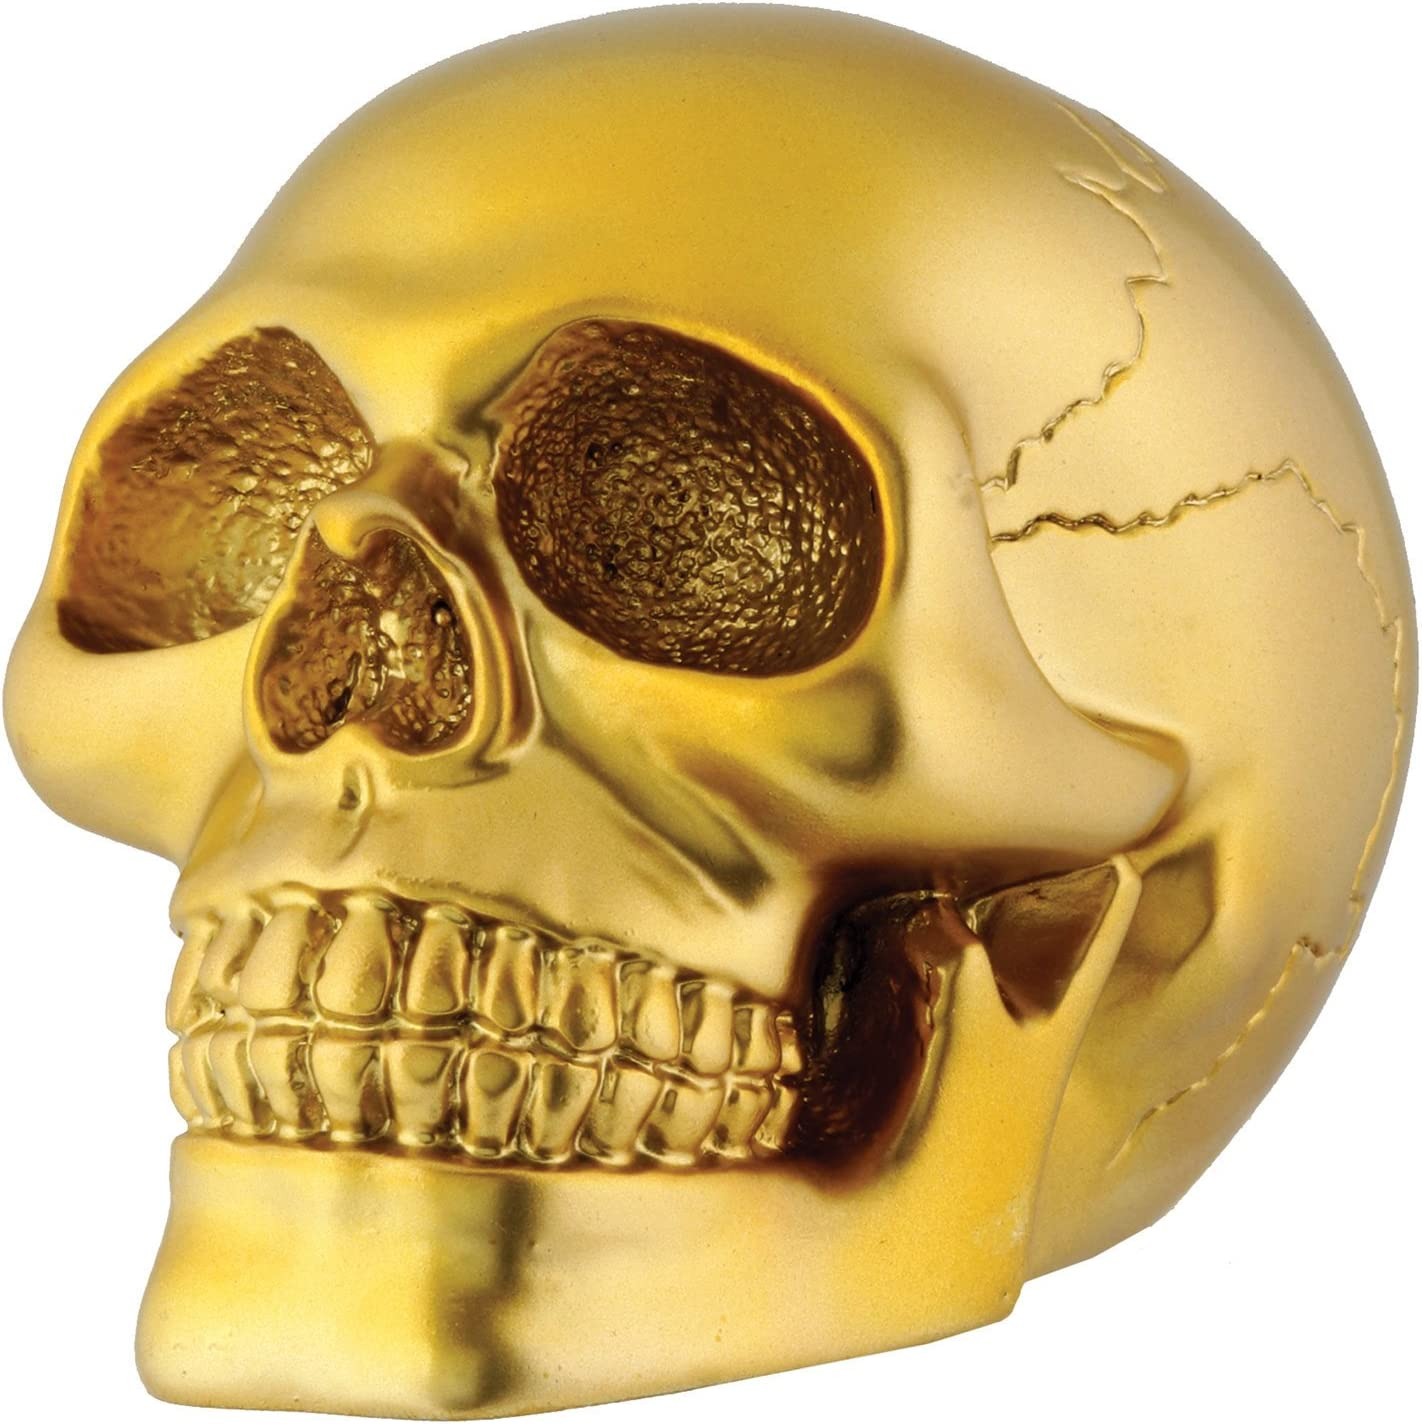 Gold Skull Head Collectible Skeleton Decoration Figurine Model